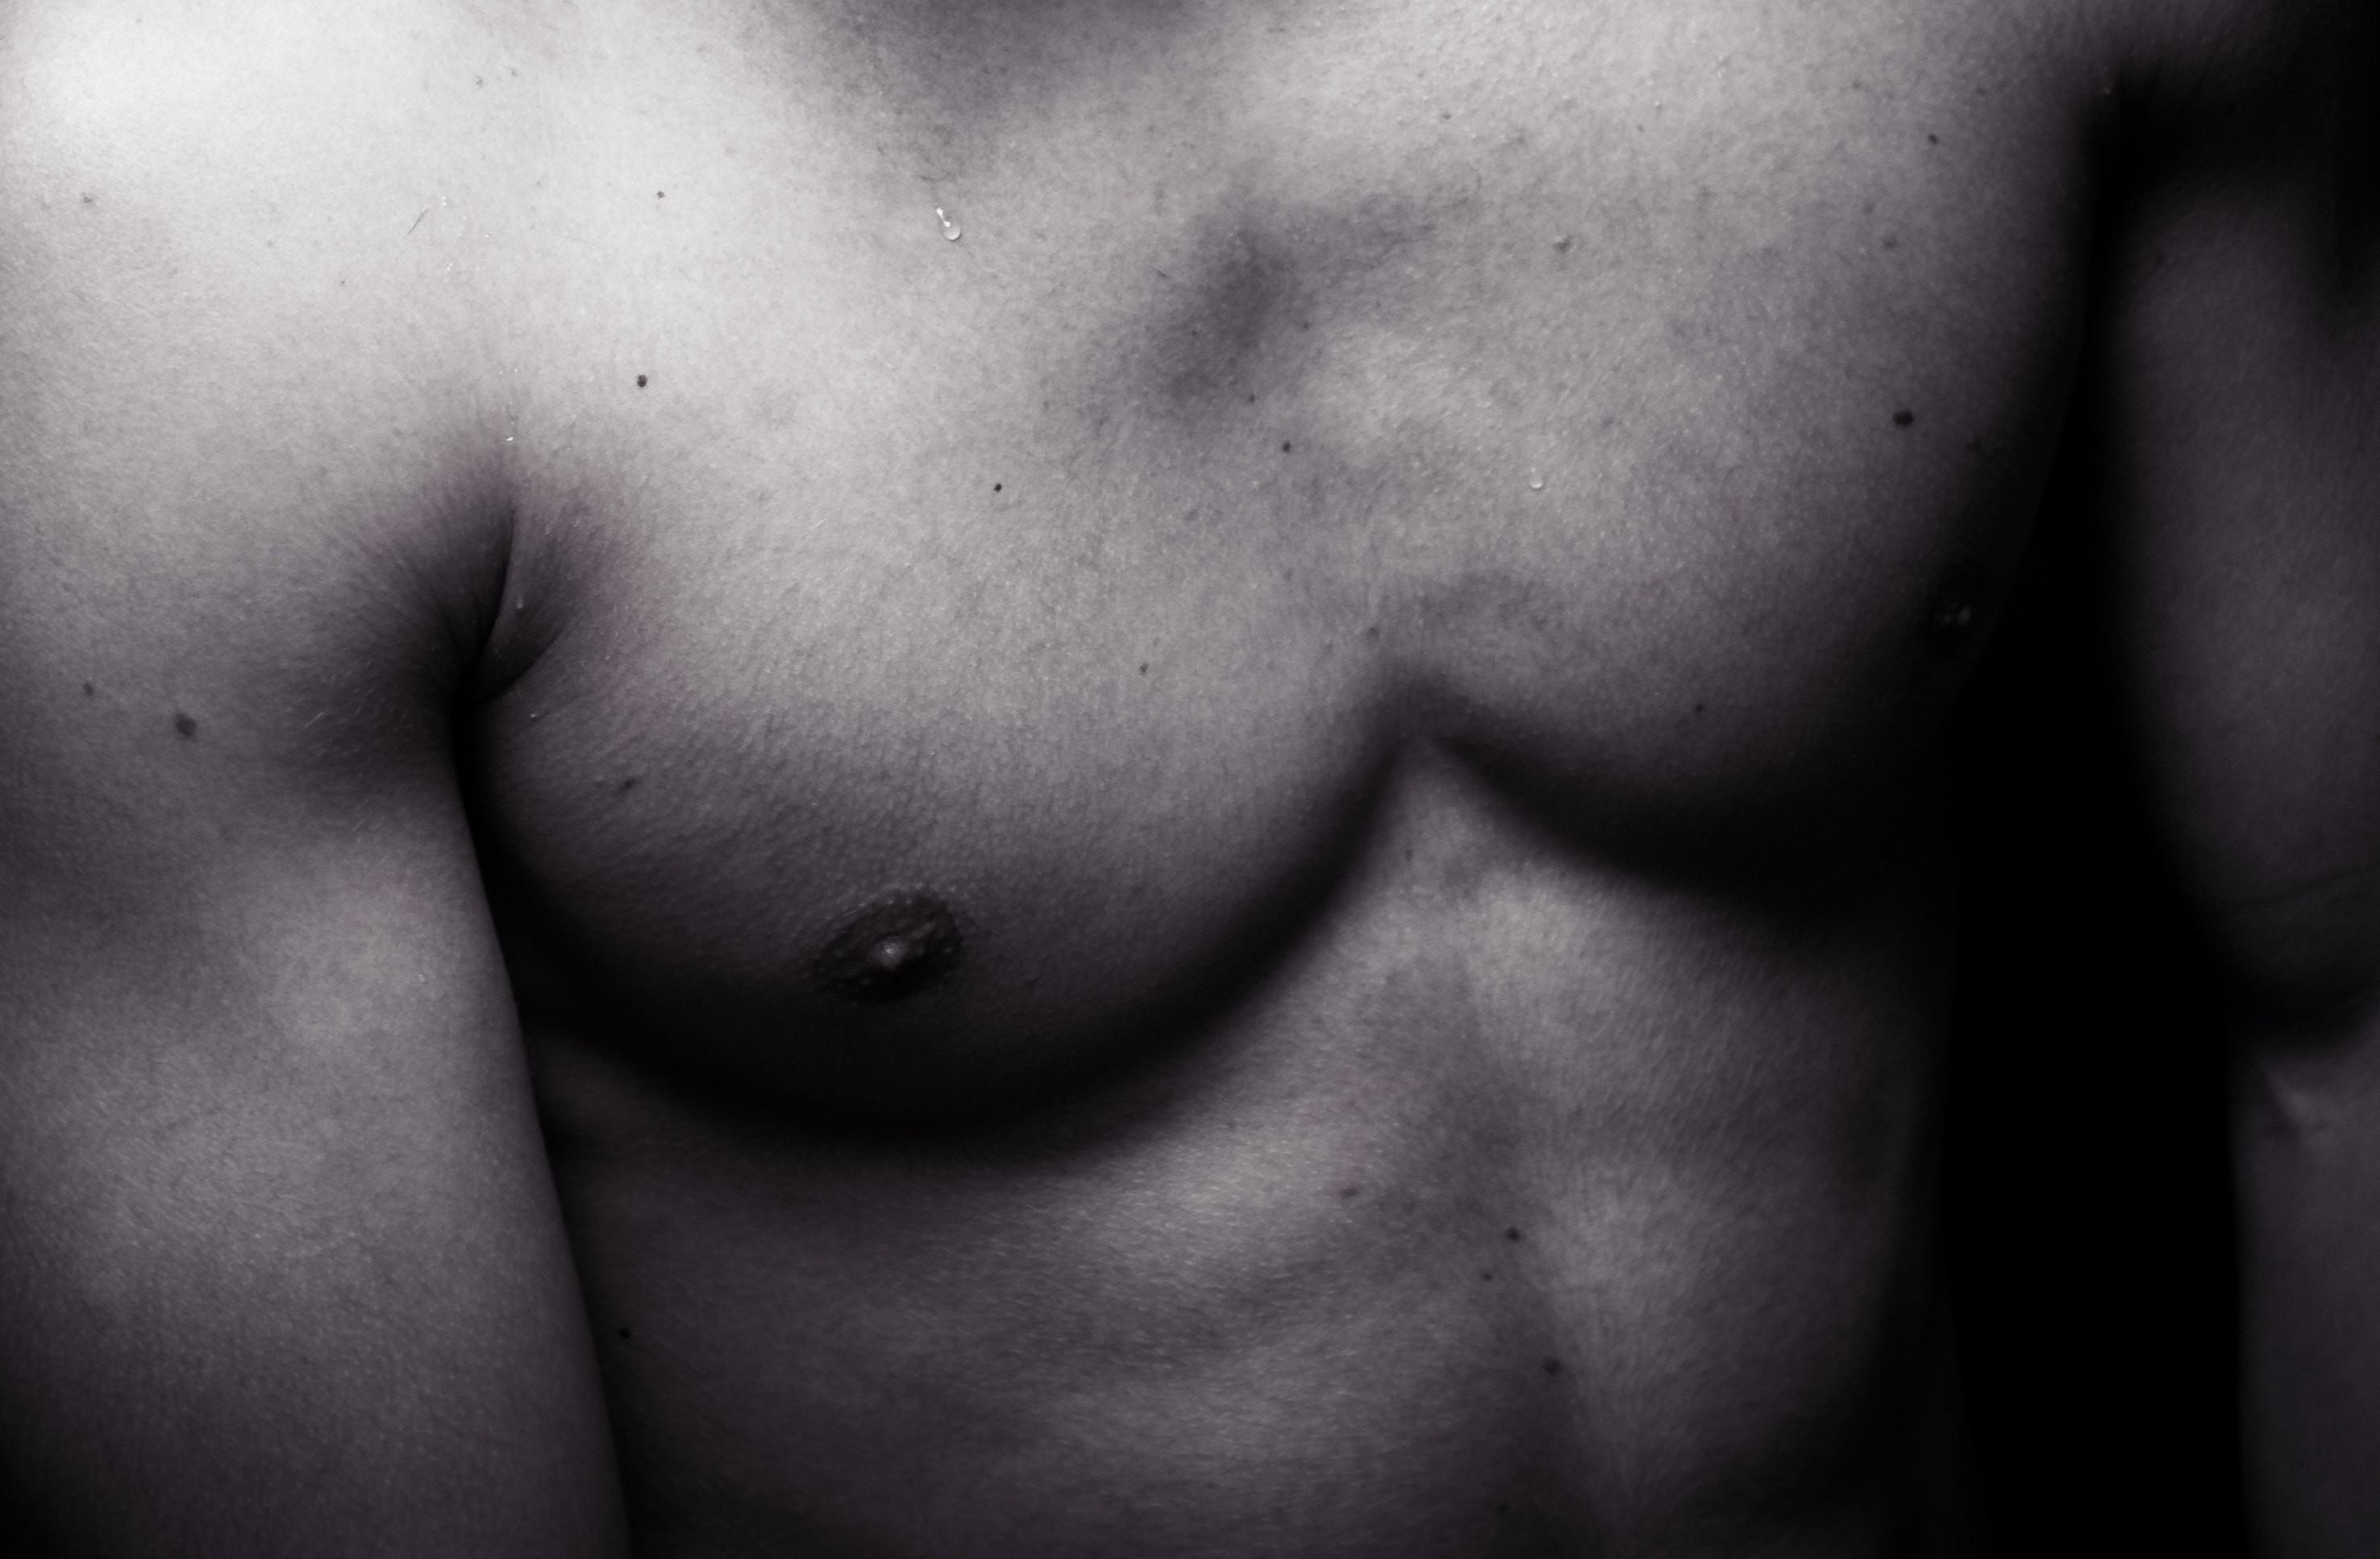 Depilación masculina - Tratamientos estéticos para hombres